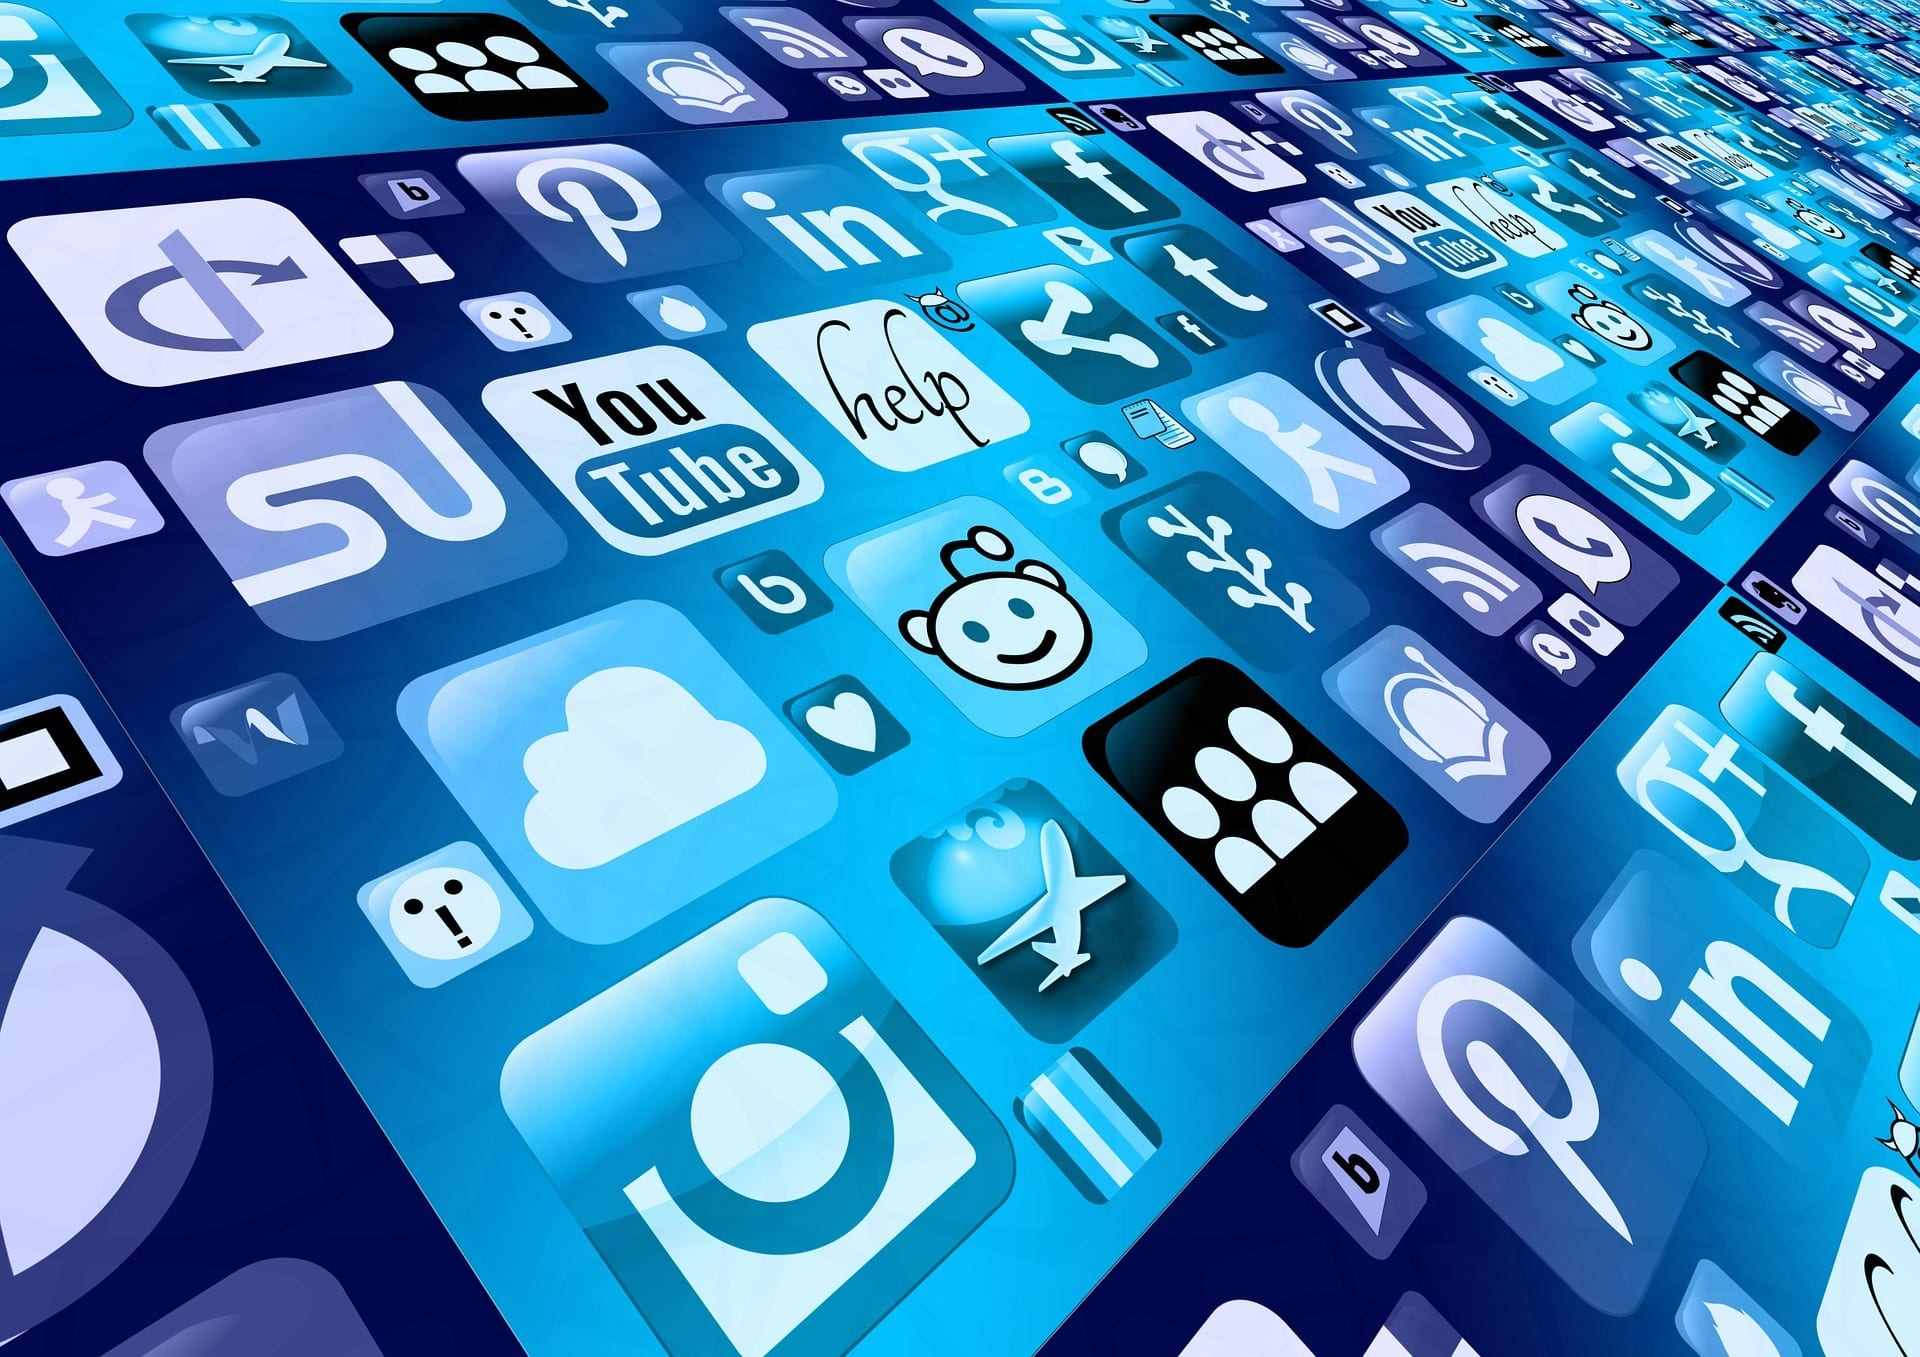 Google+ Decline and Future of social media